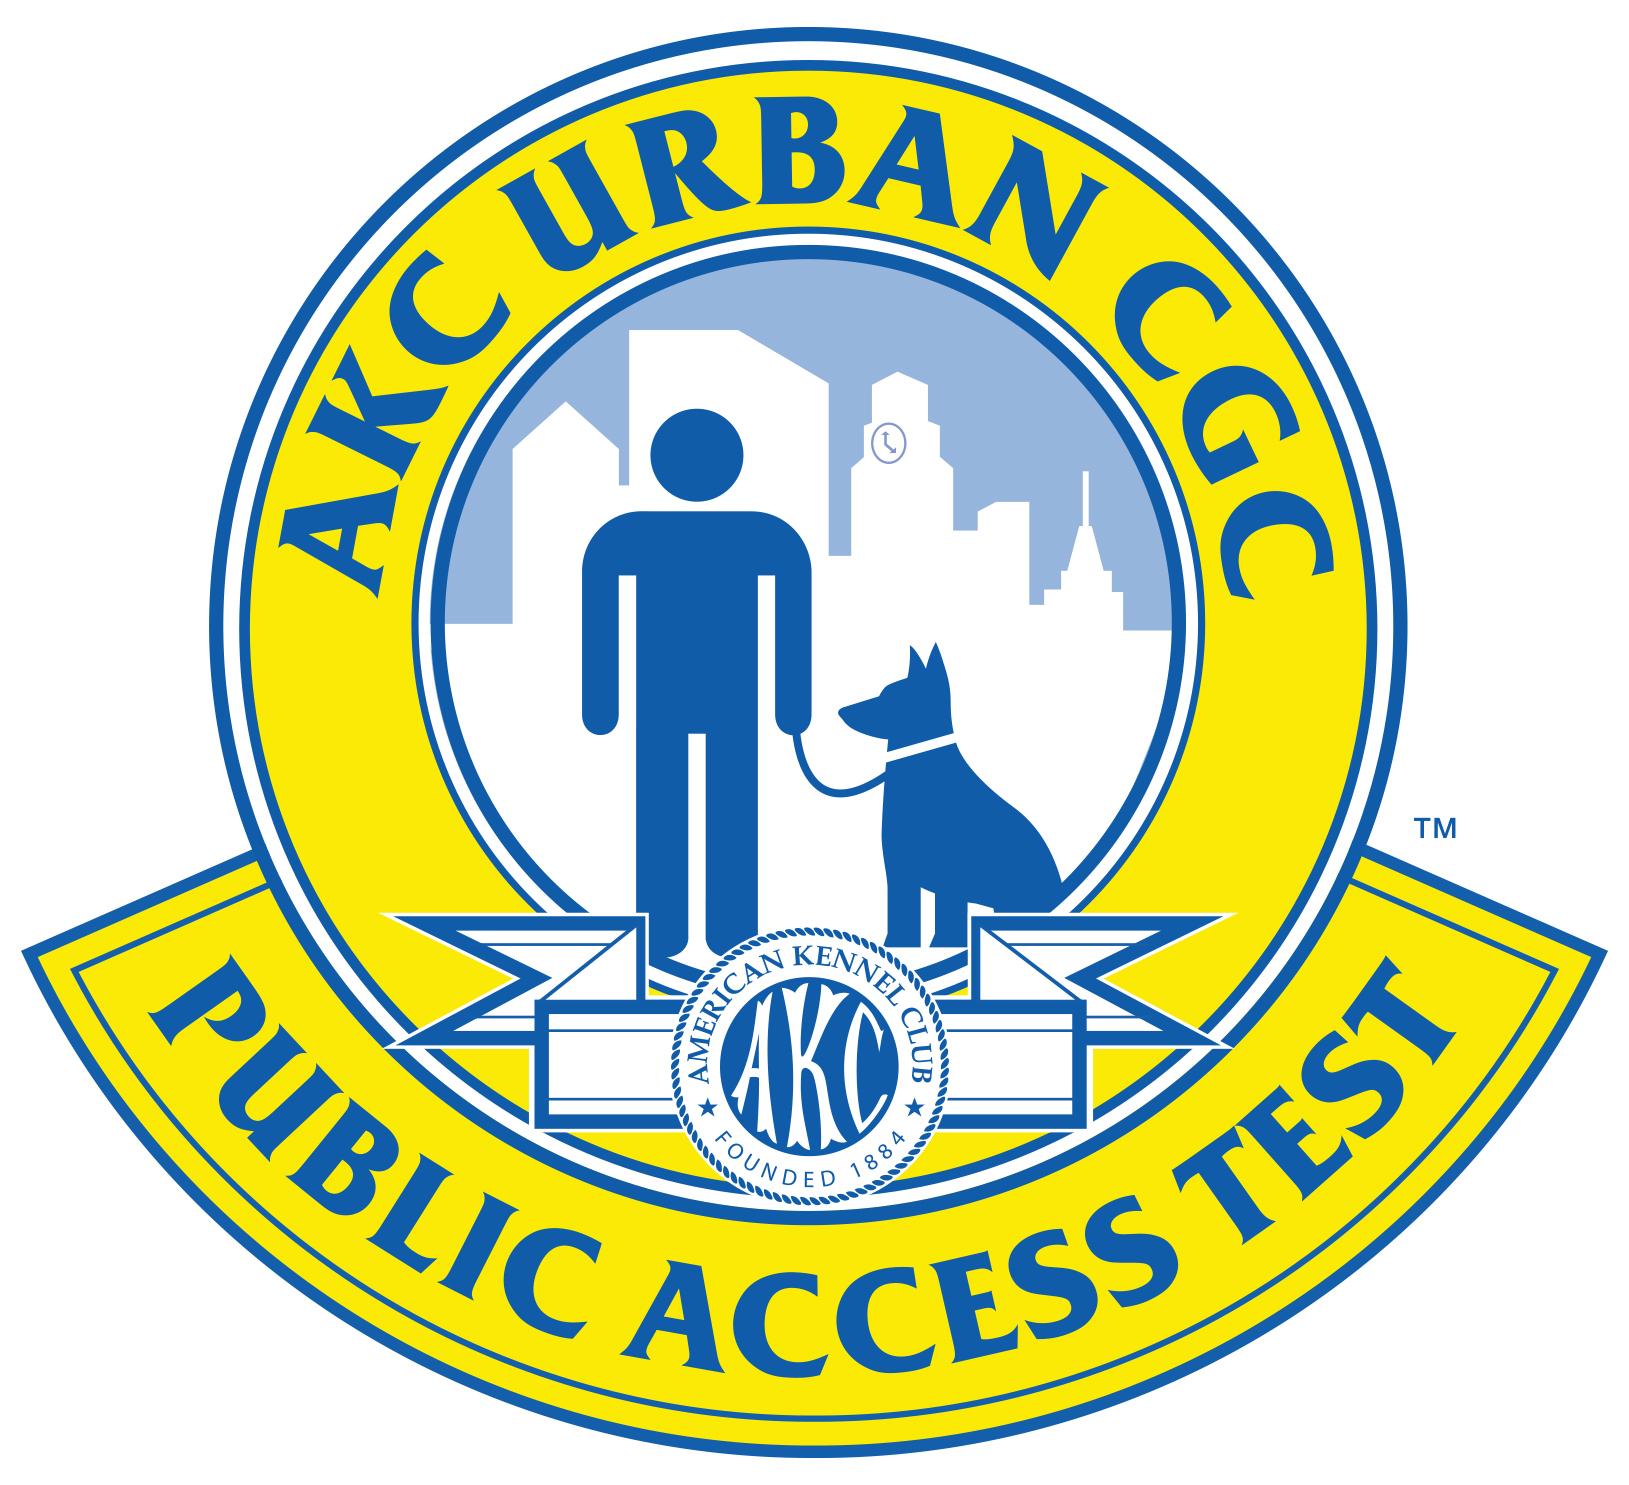 AKC-Urban-CGC-Public-Access-Test-Logo